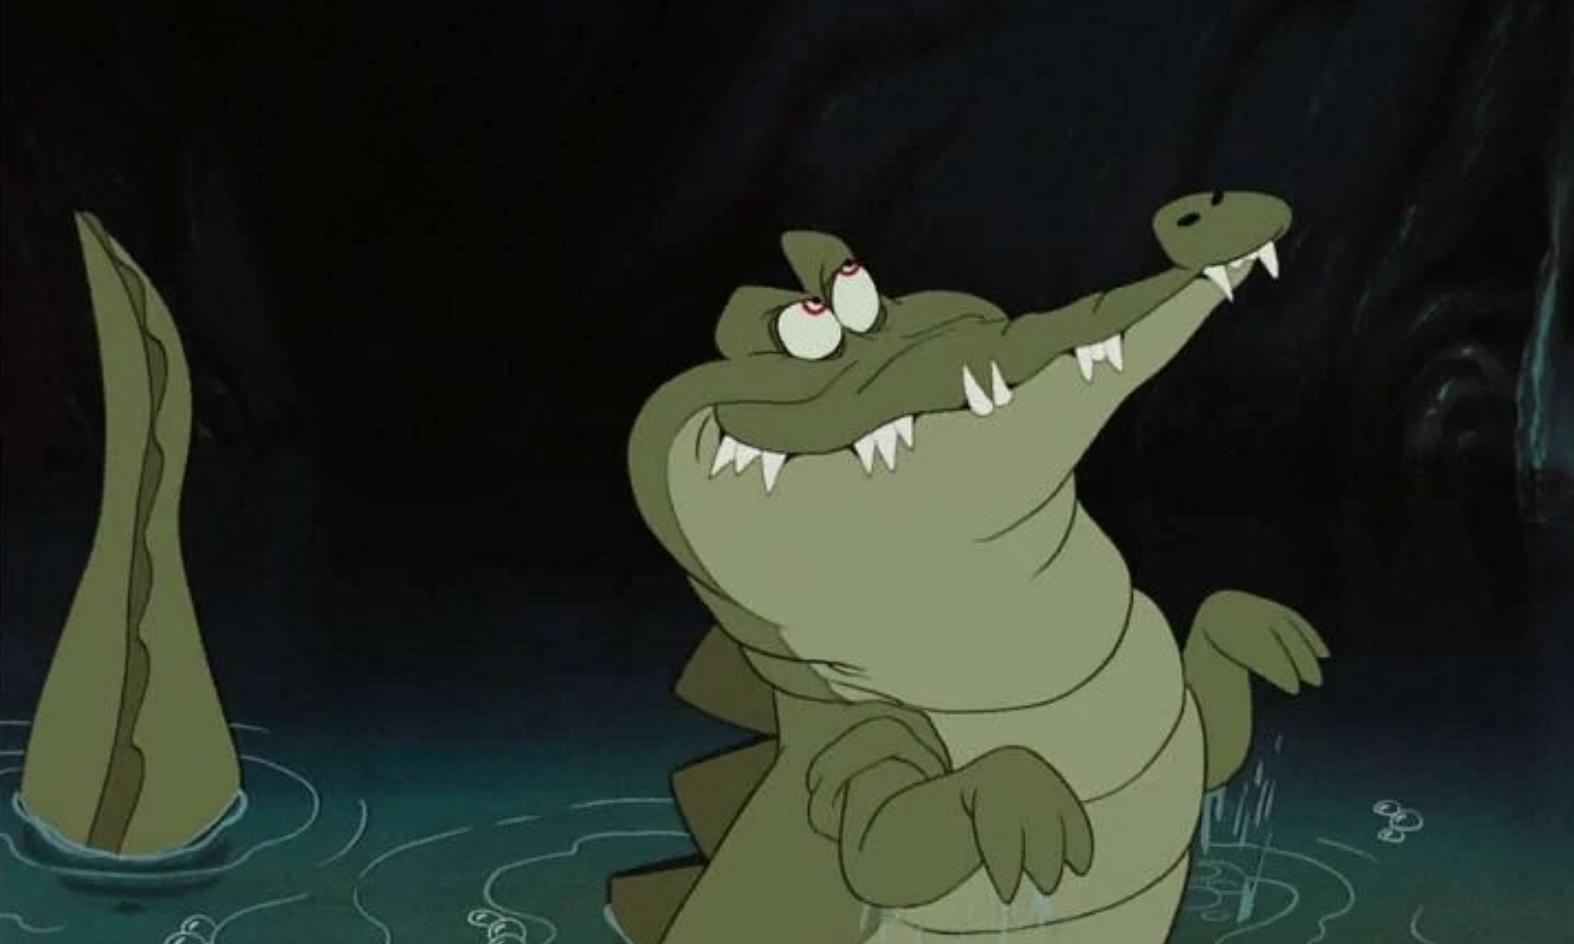 Police Warn Against Rise Of Meth Gators In Alabama